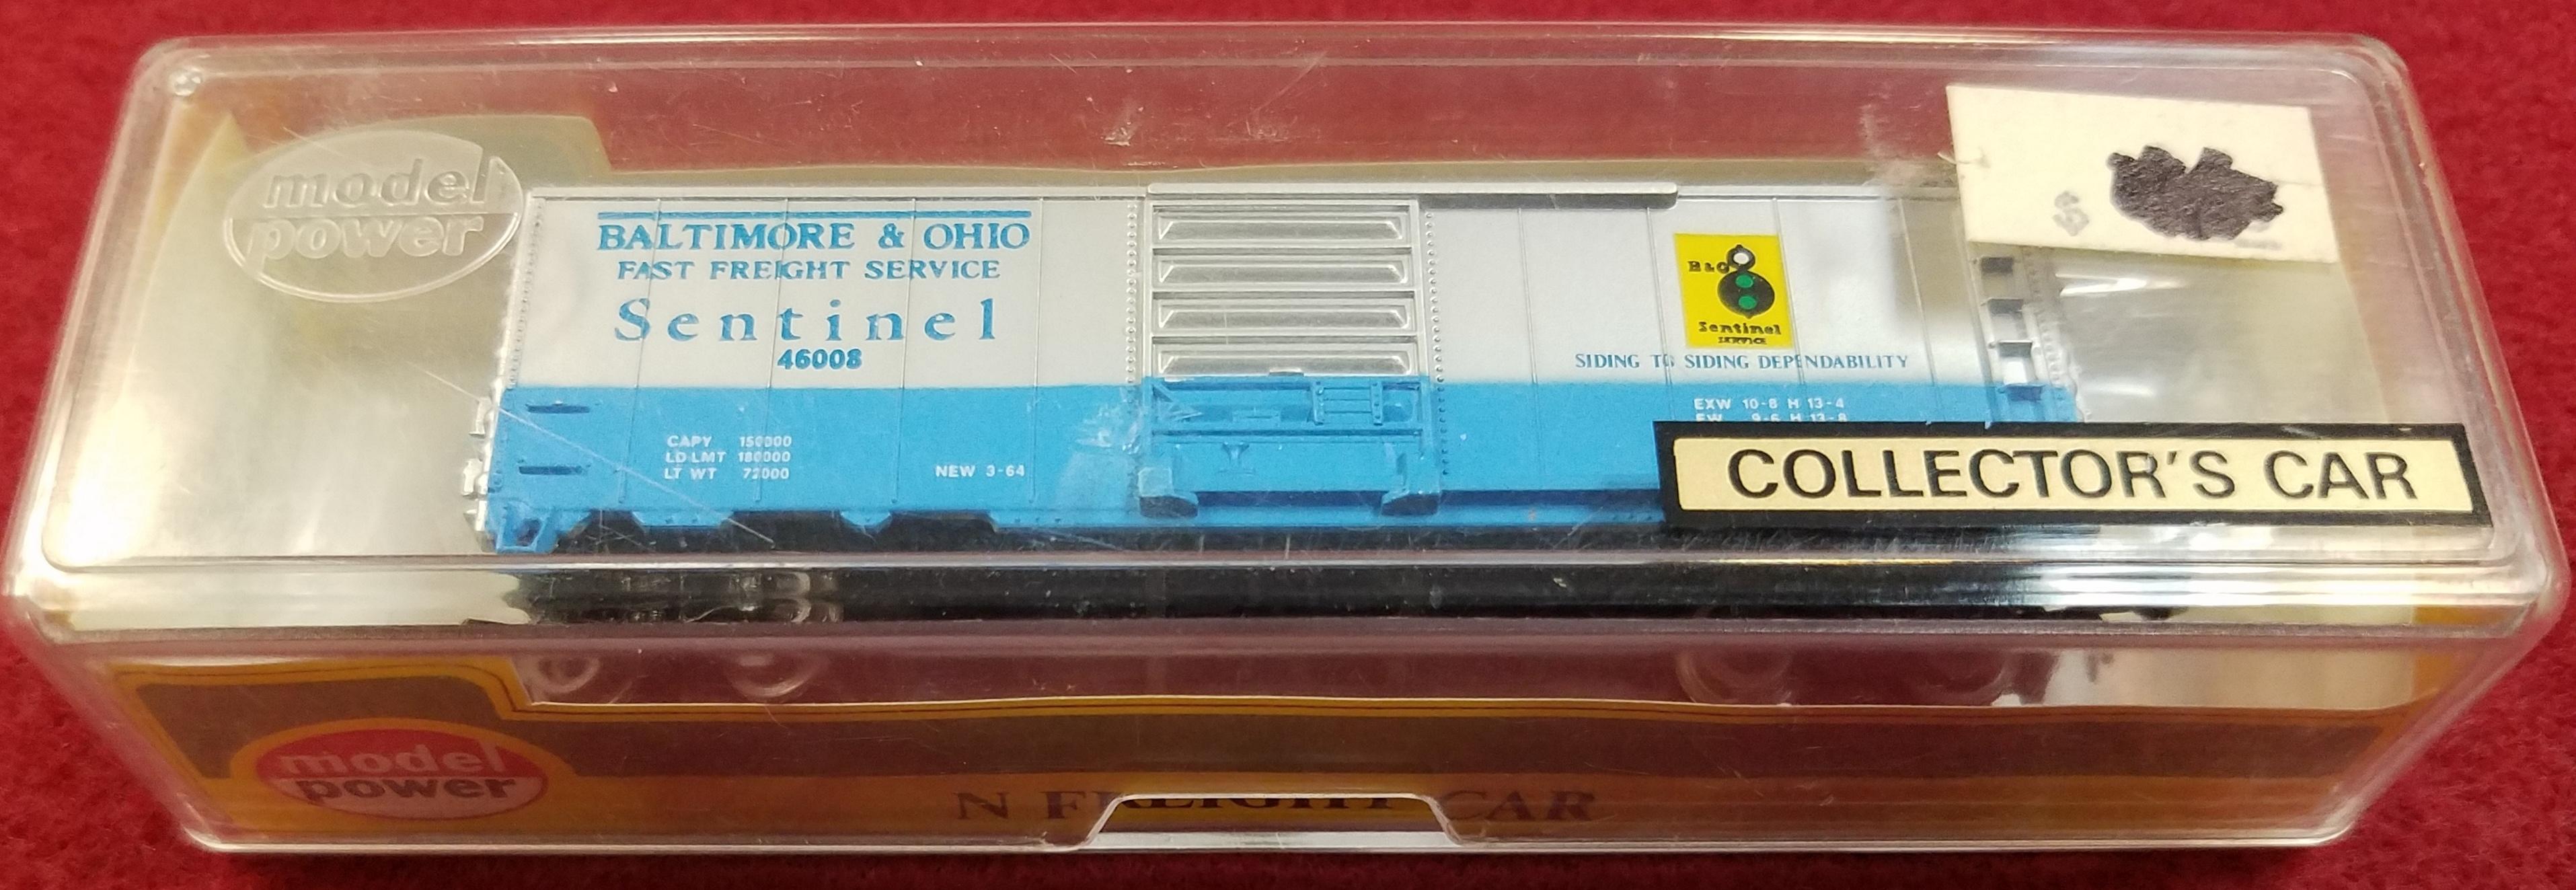 MODEL POWER - N SCALE - BALTIMORE & OHIO SENTINEL 46008 - NO.3701